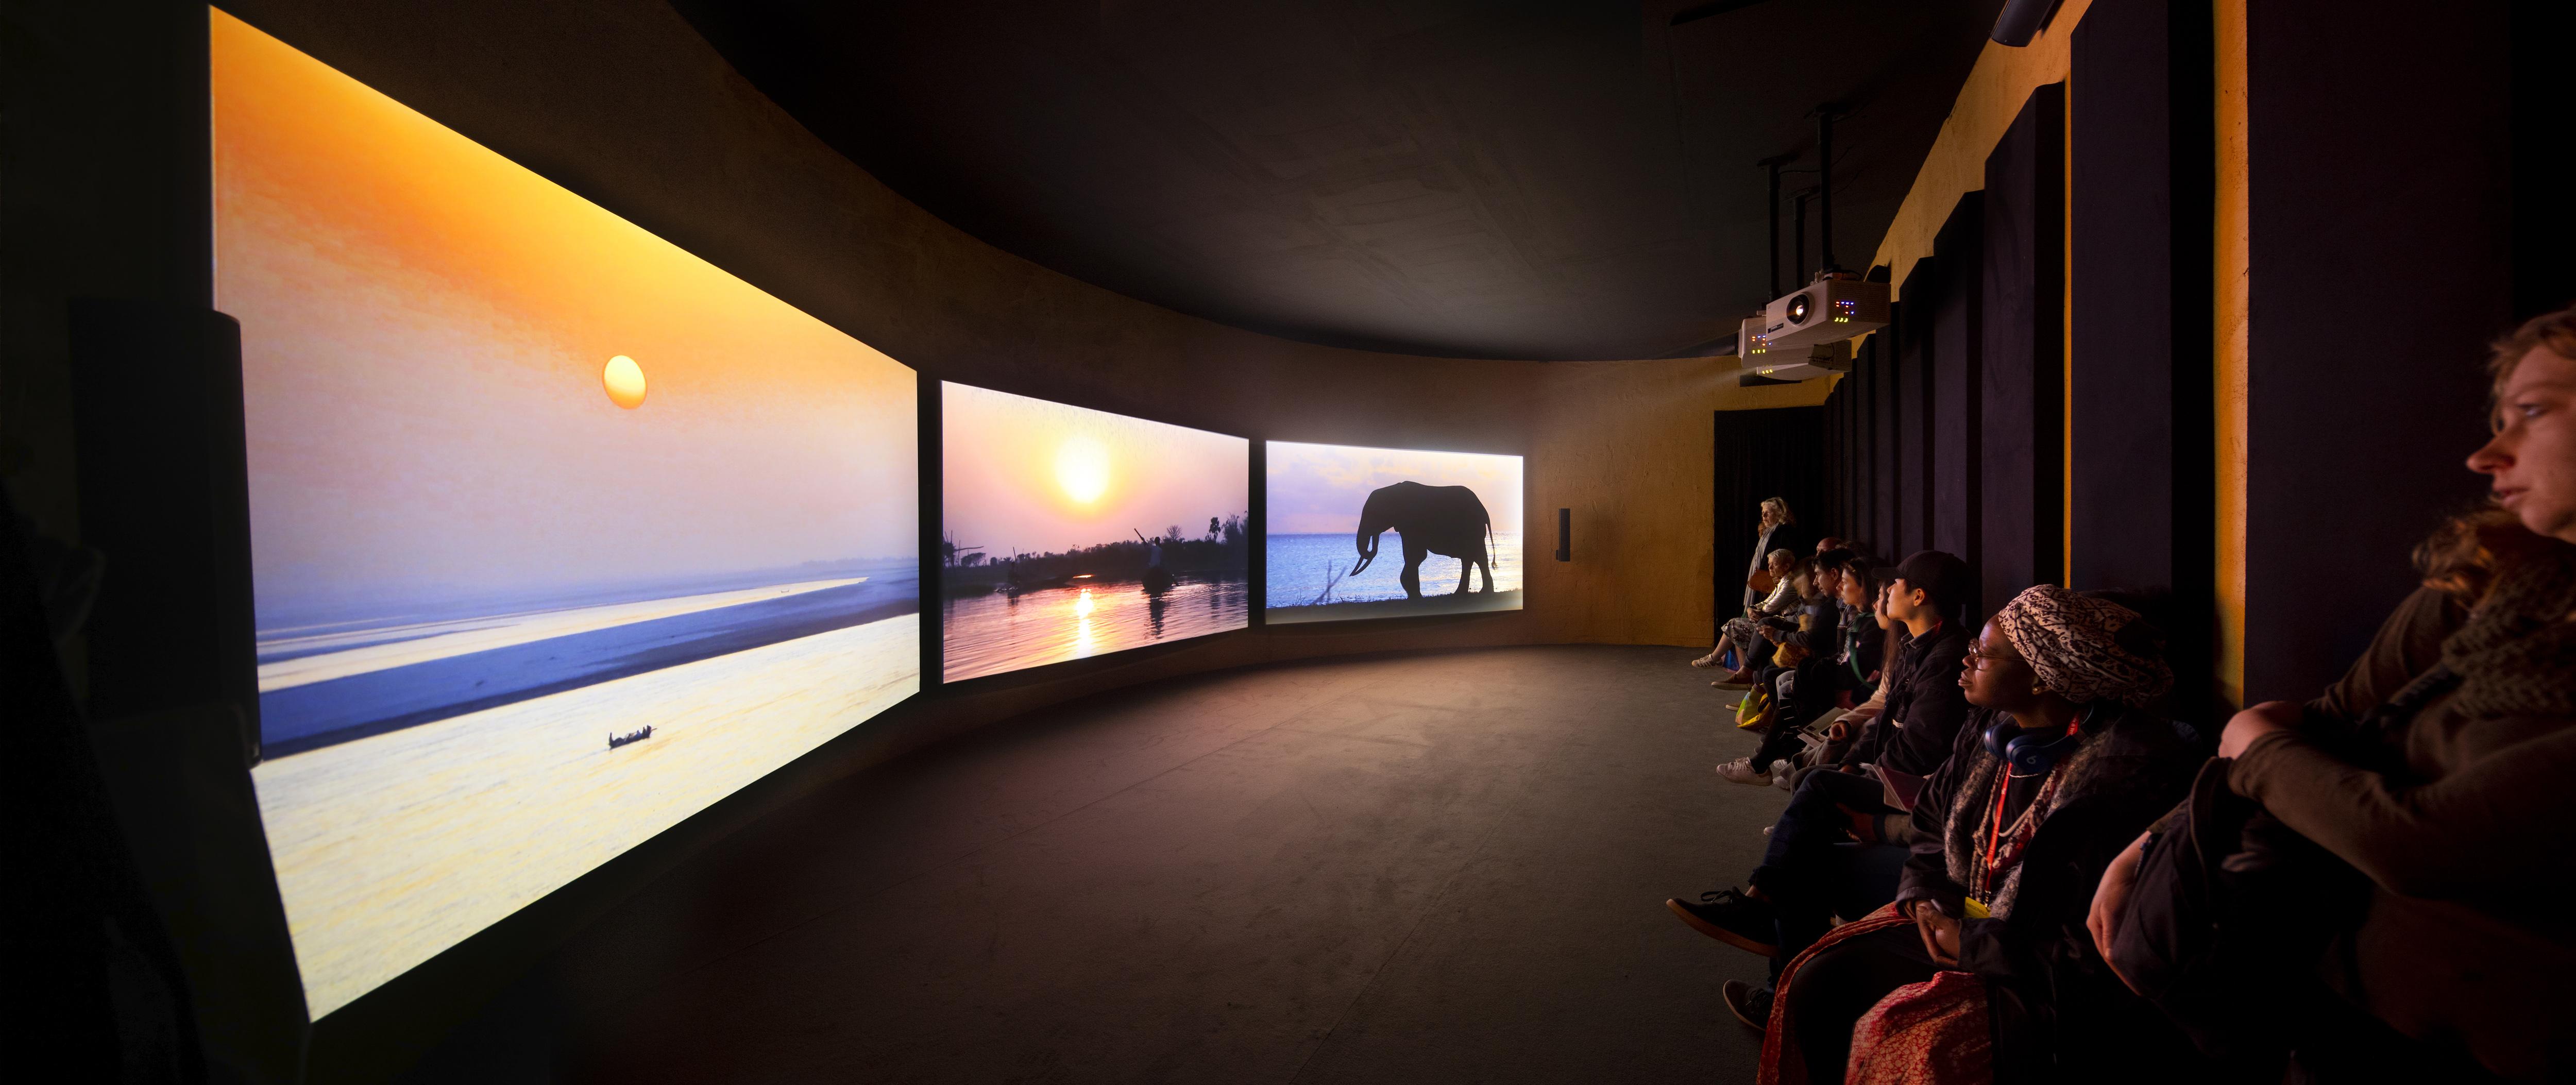 Venice Biennale 2019: Ghana makes star-studded debut - CNN Style